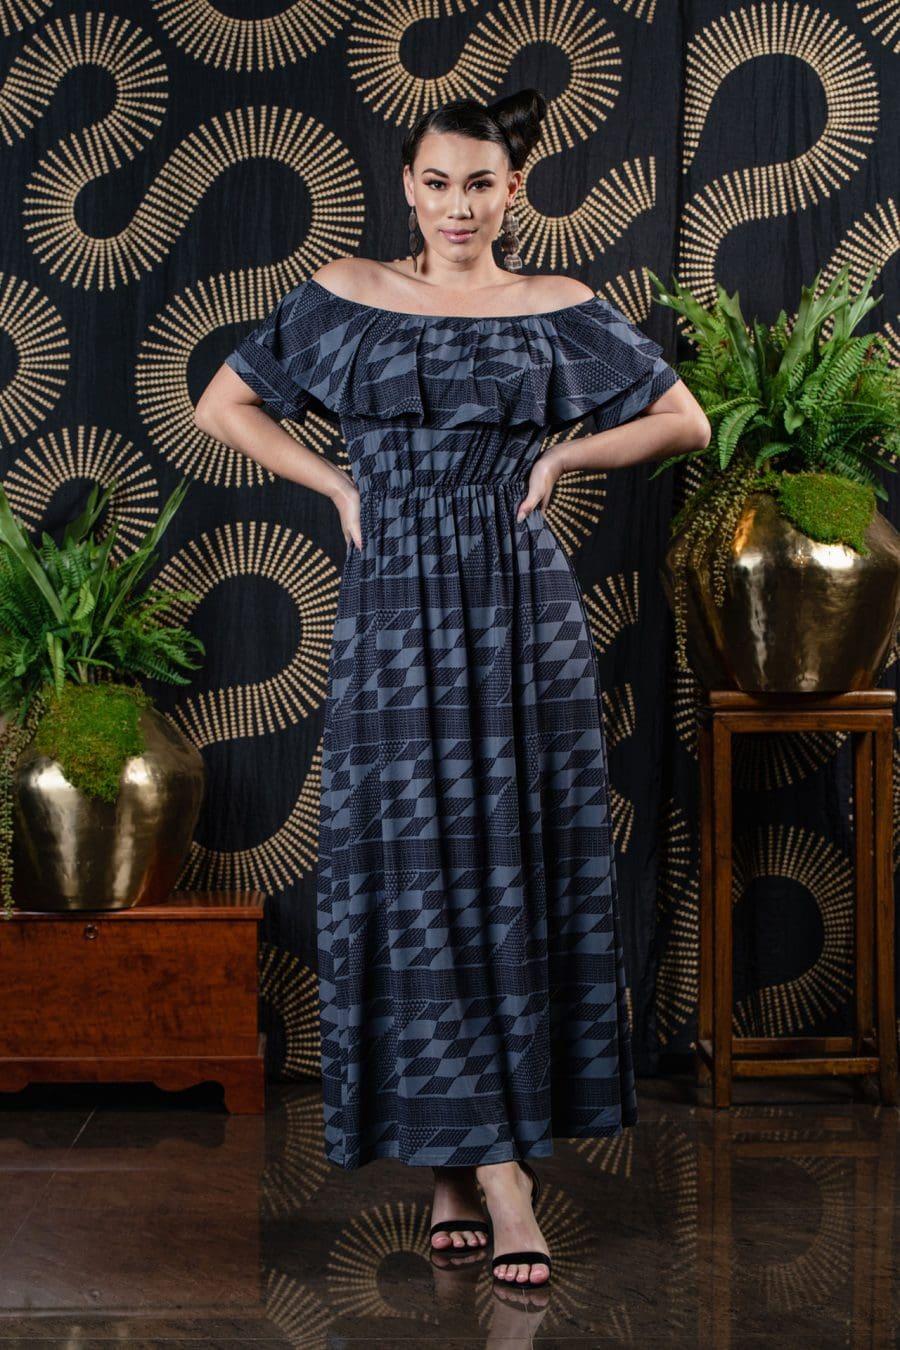 Model wearing Punaluu Maxi Dress in Folkstone Grey/Deepwell Kamehameha - Front View